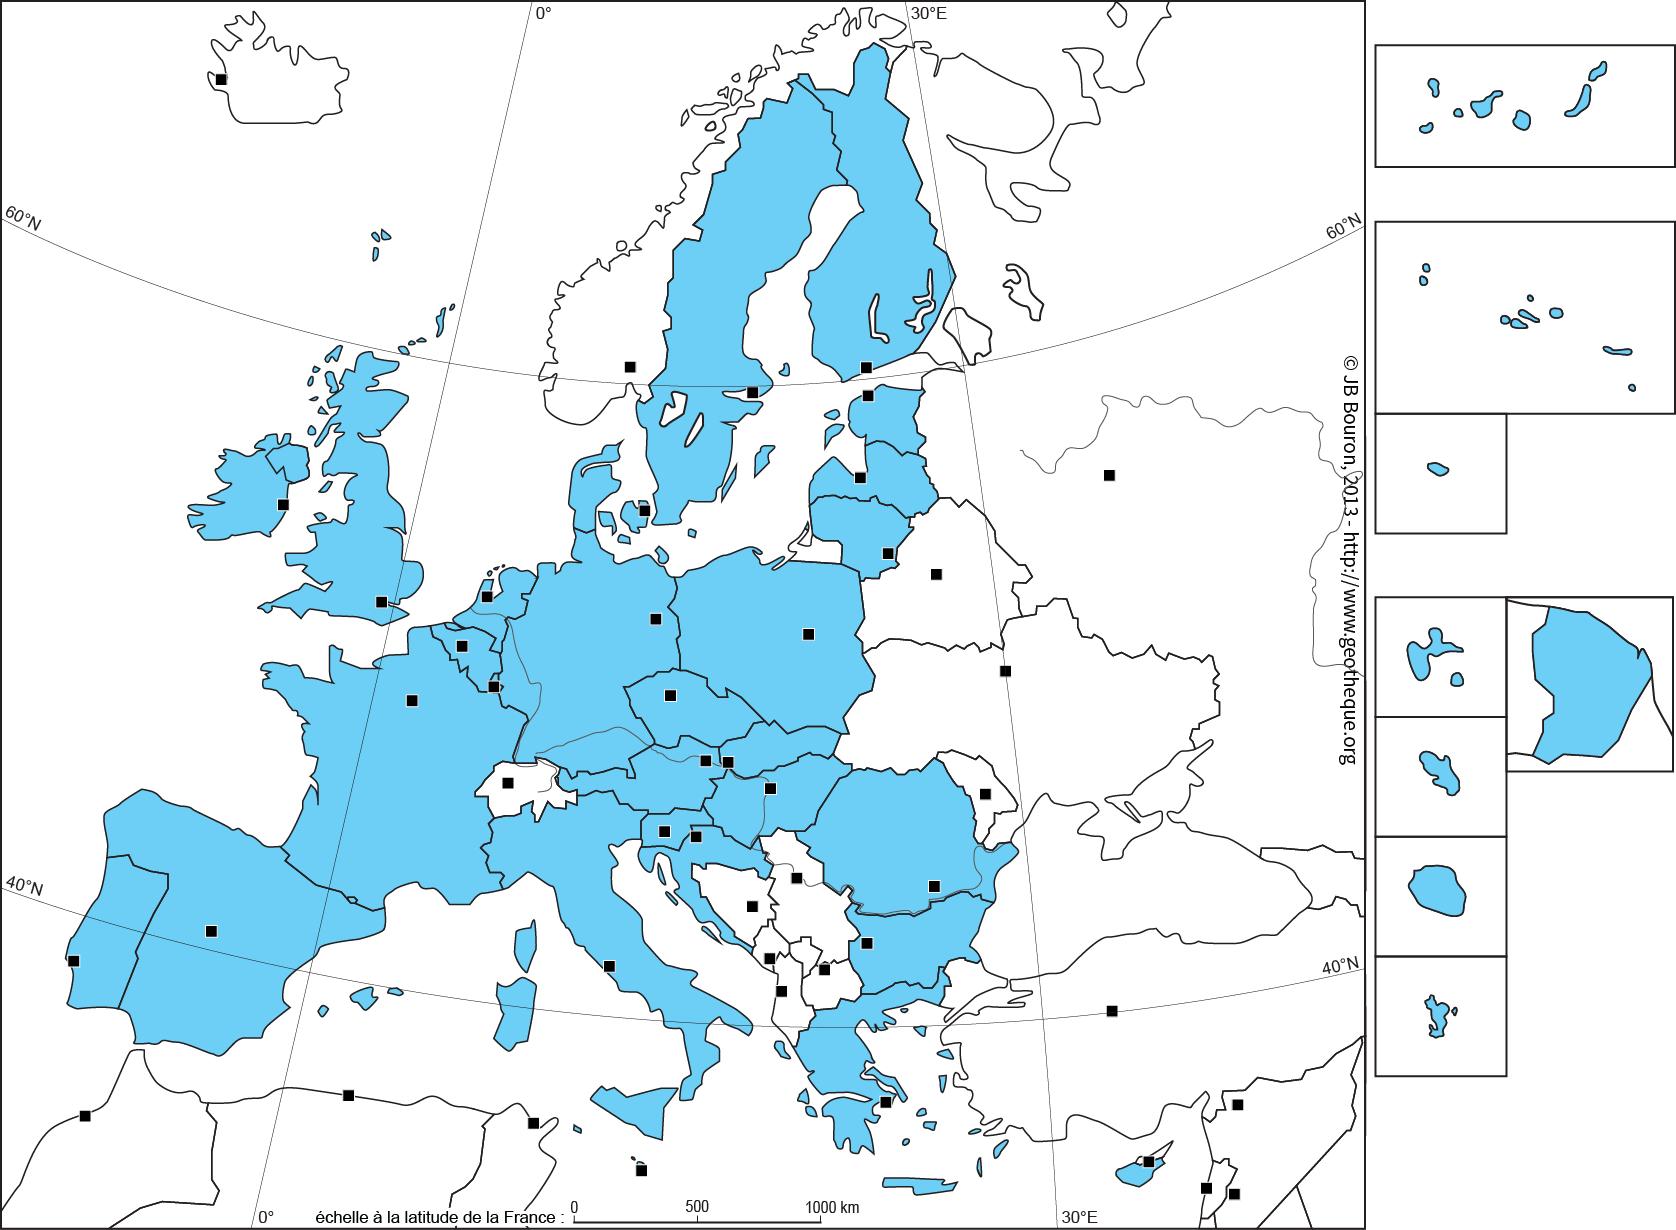 Fond De Carte De L'union Européenne À 28 - Ue28 - Eu28 Map destiné Union Européenne Carte Vierge